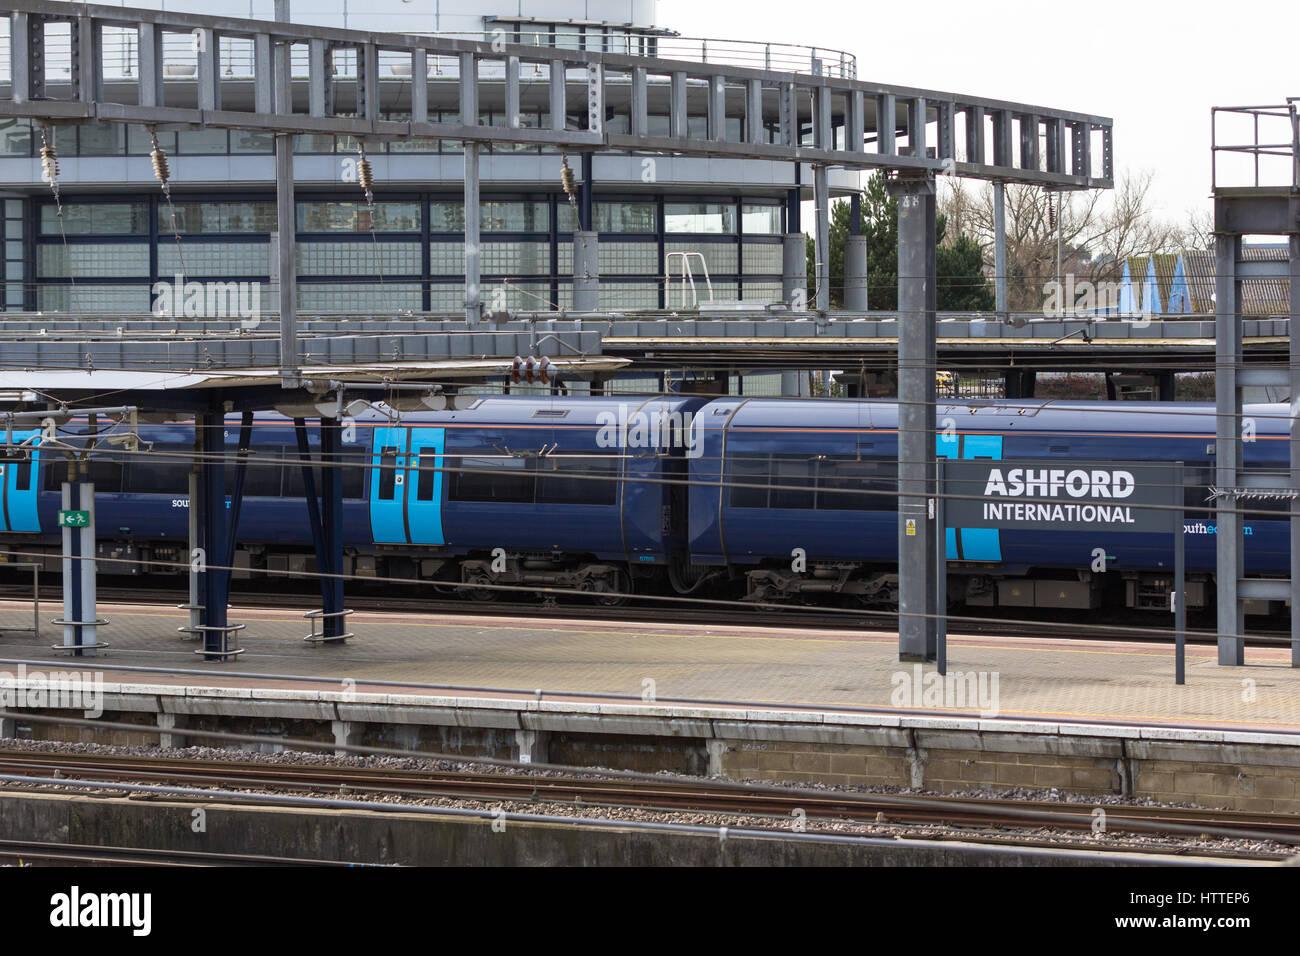 Ashford international train station and southeastern train Ashford, Kent - Stock Image